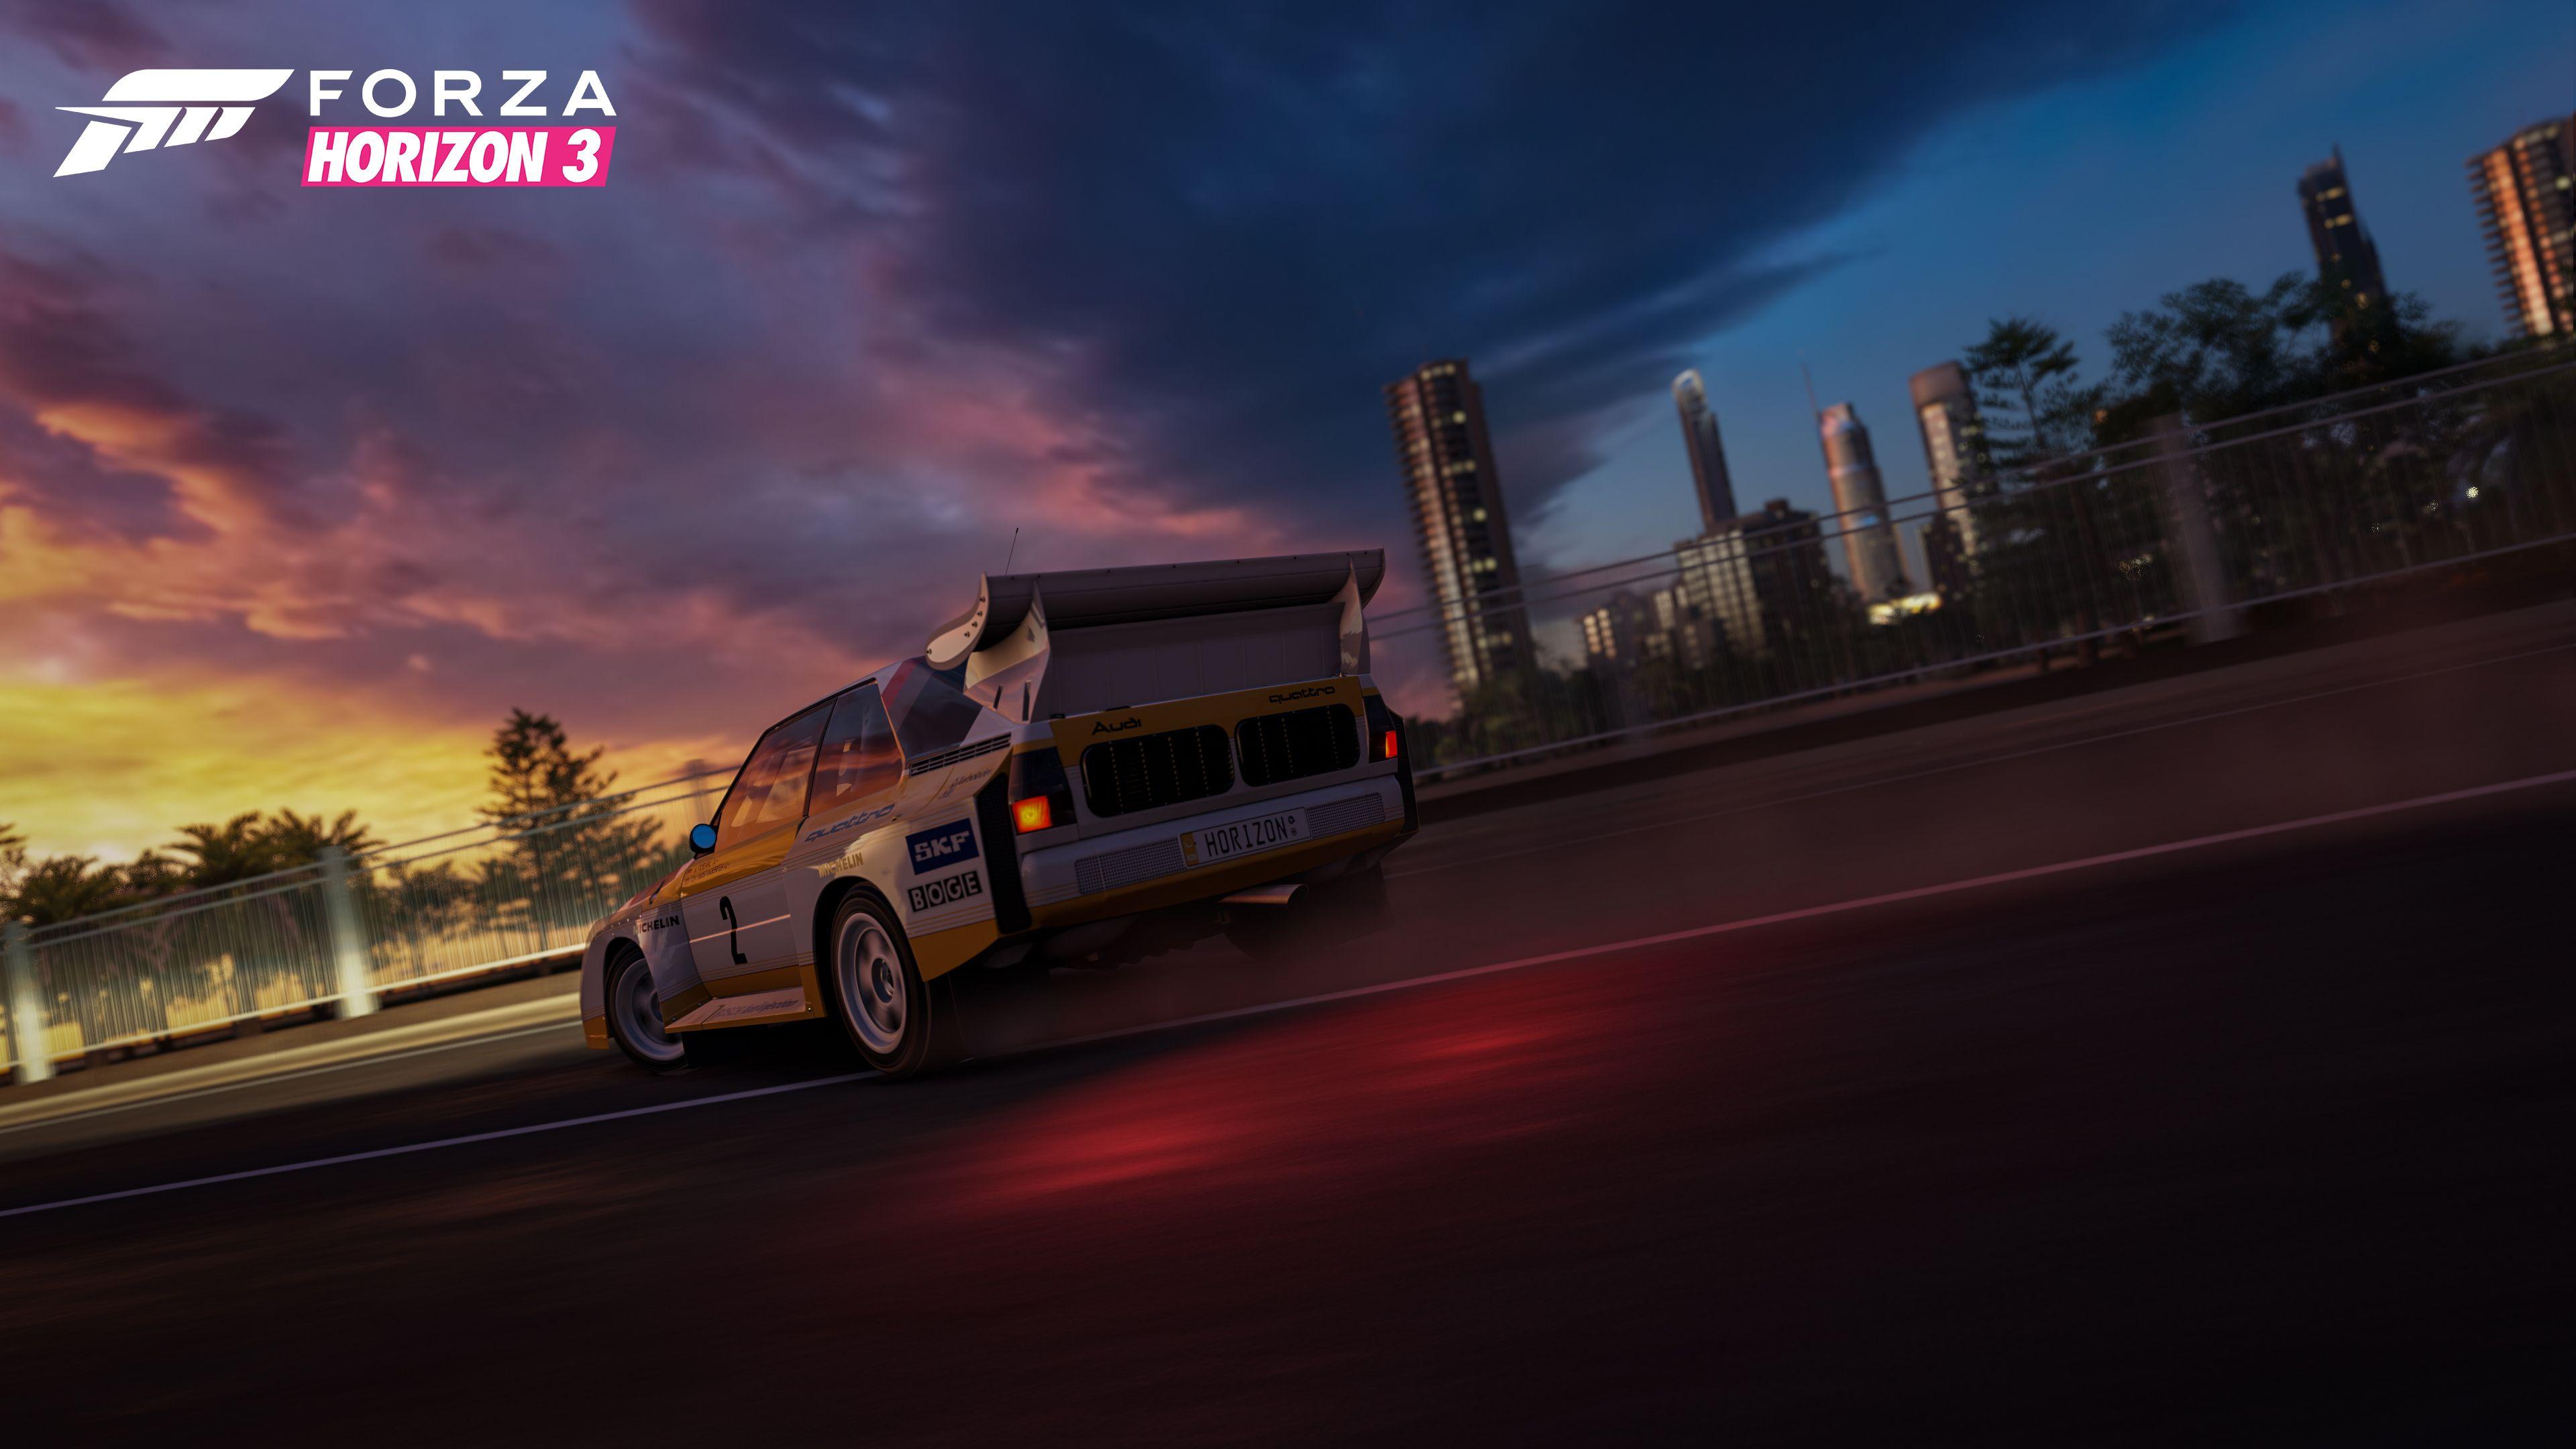 Forza Horizon 3 Sunset Skyline